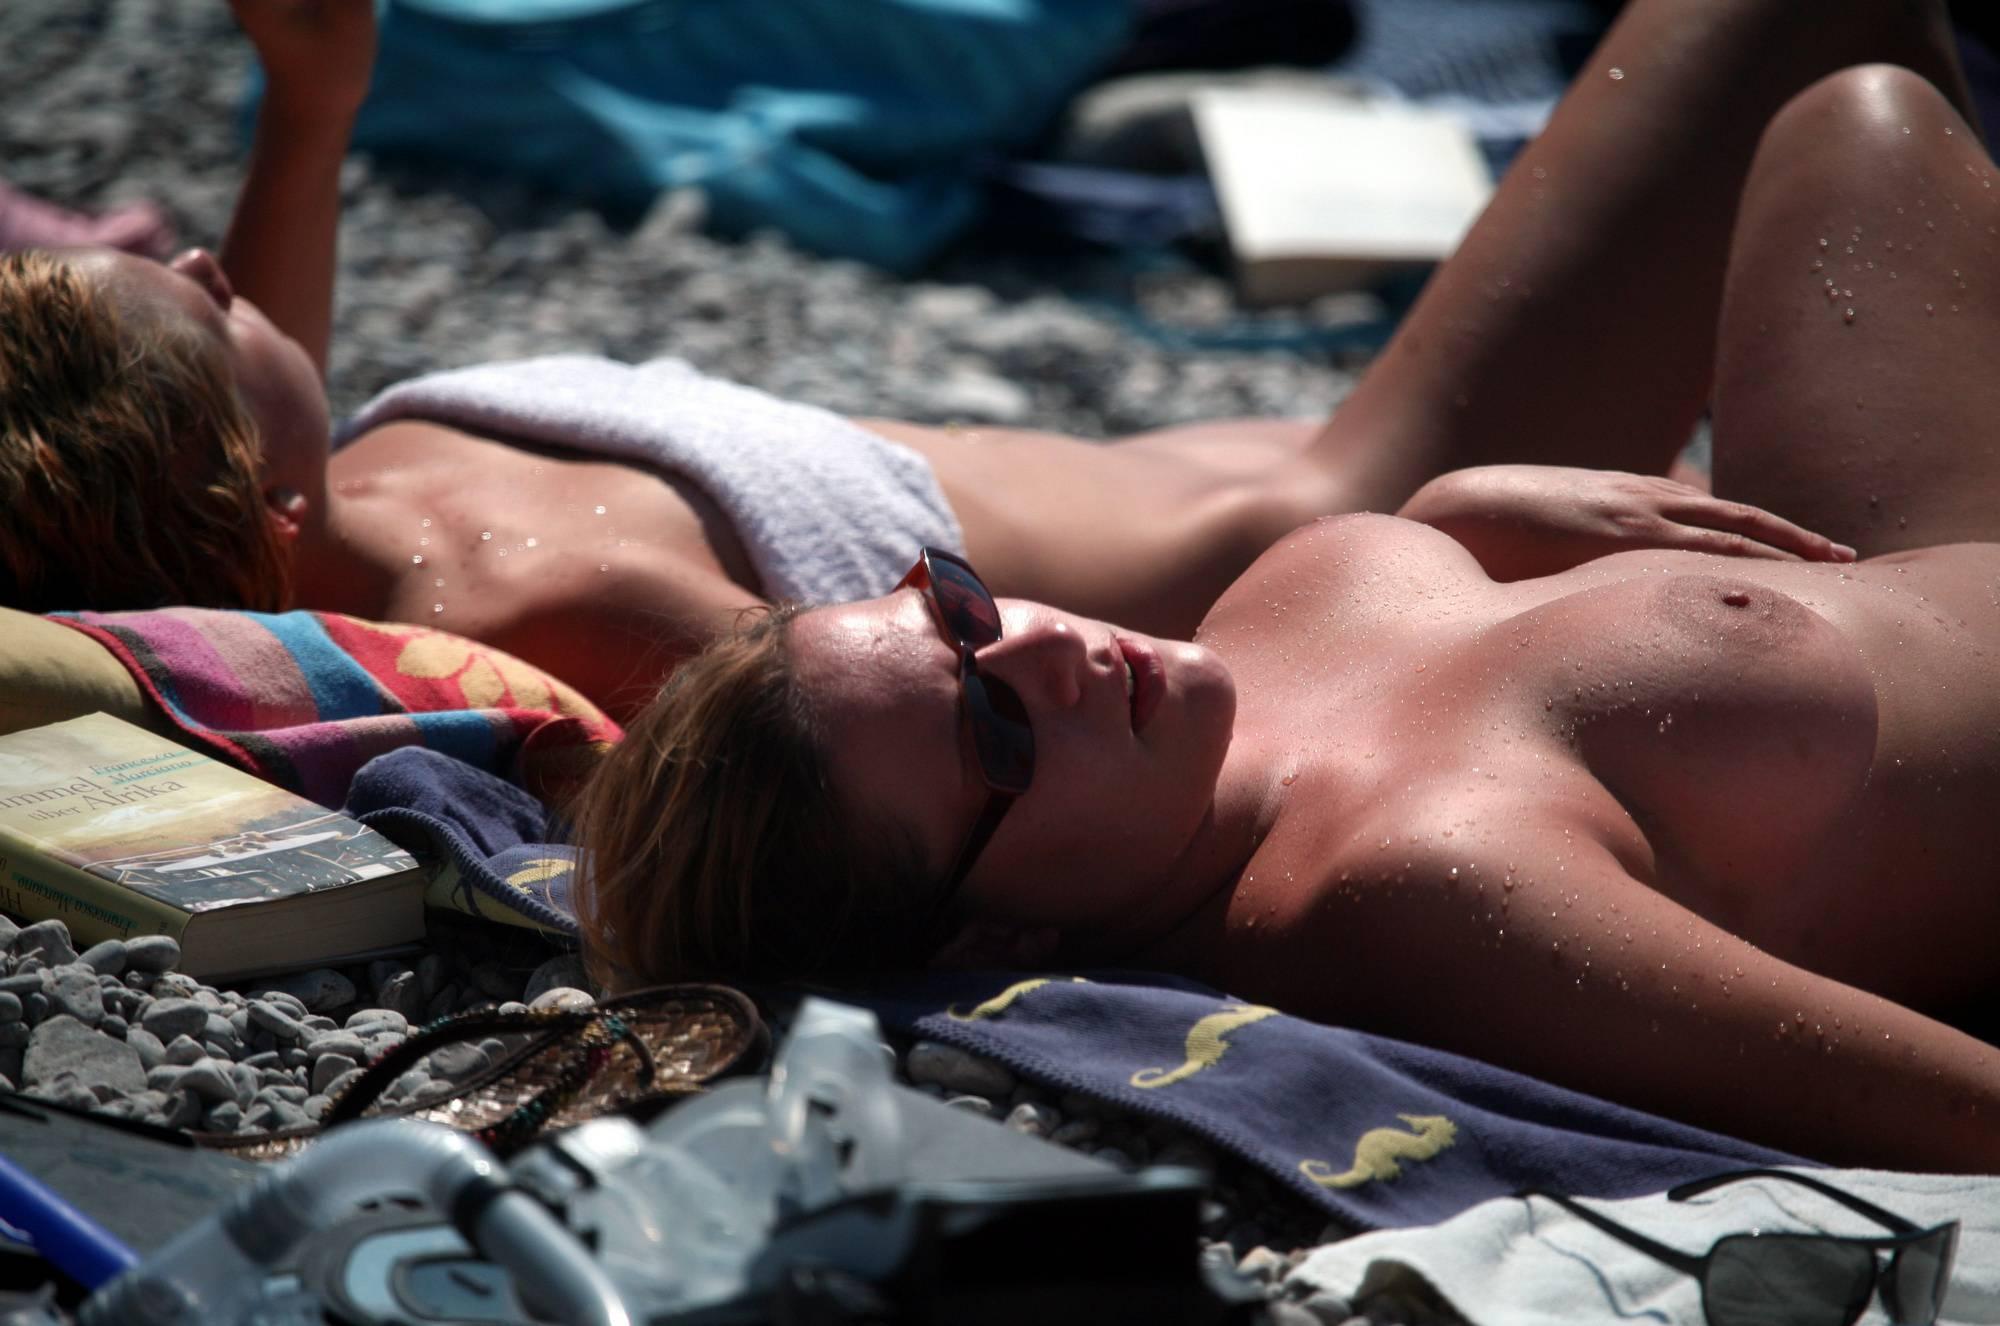 Nudist Pictures Nudist Beach Photo Tour - 1